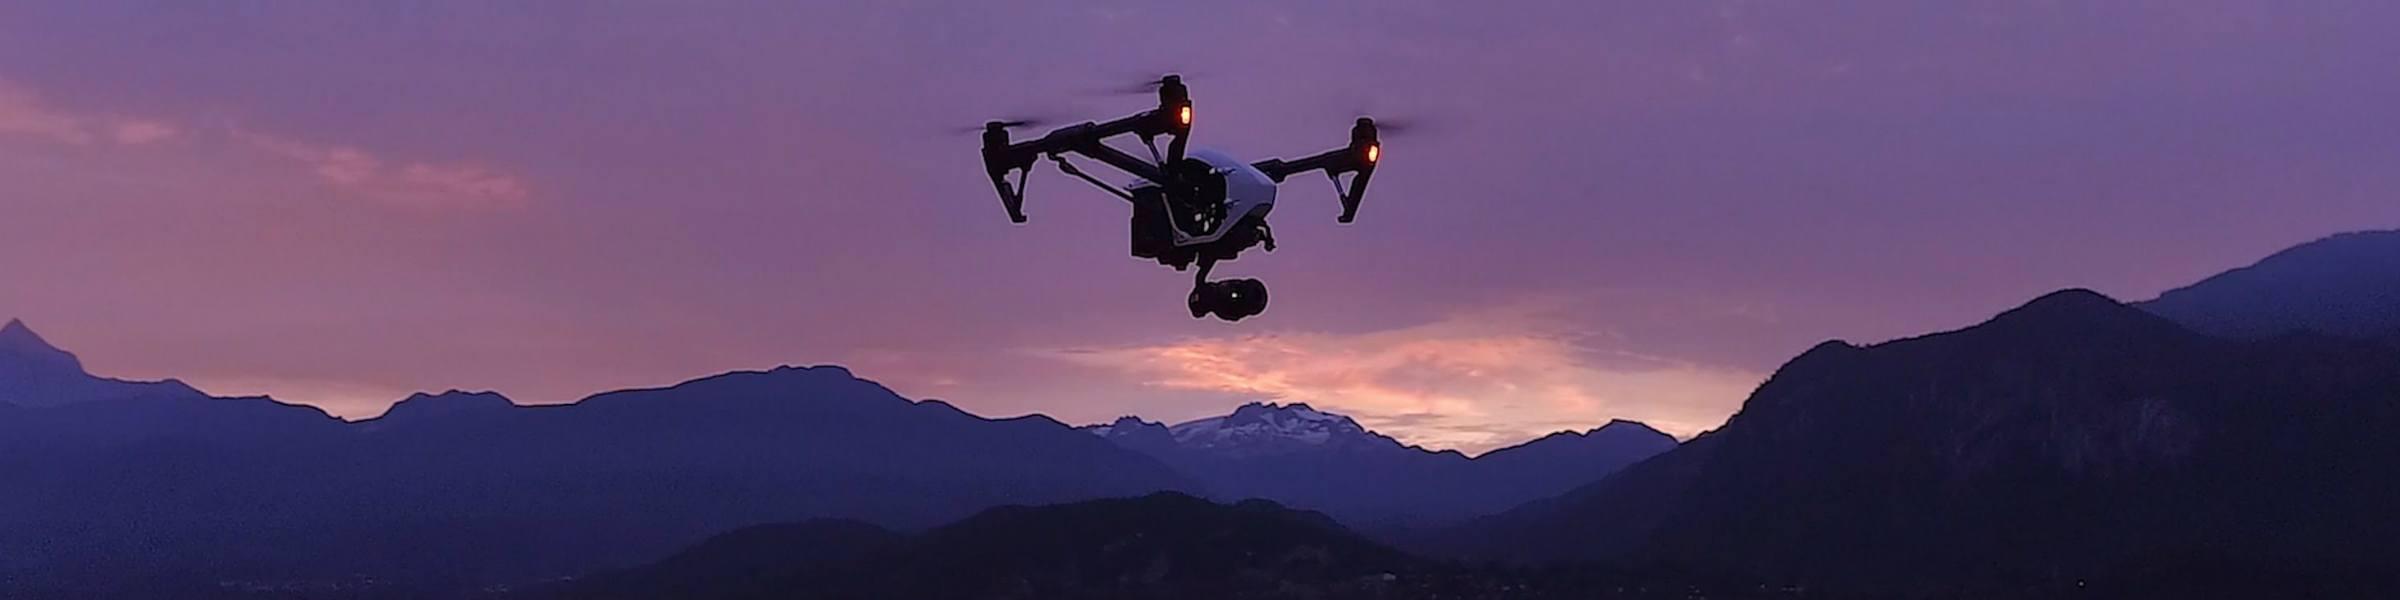 DJI-Inspire-Inspire2-Drone-Major-Consultancy-Services-Solutions-Hub